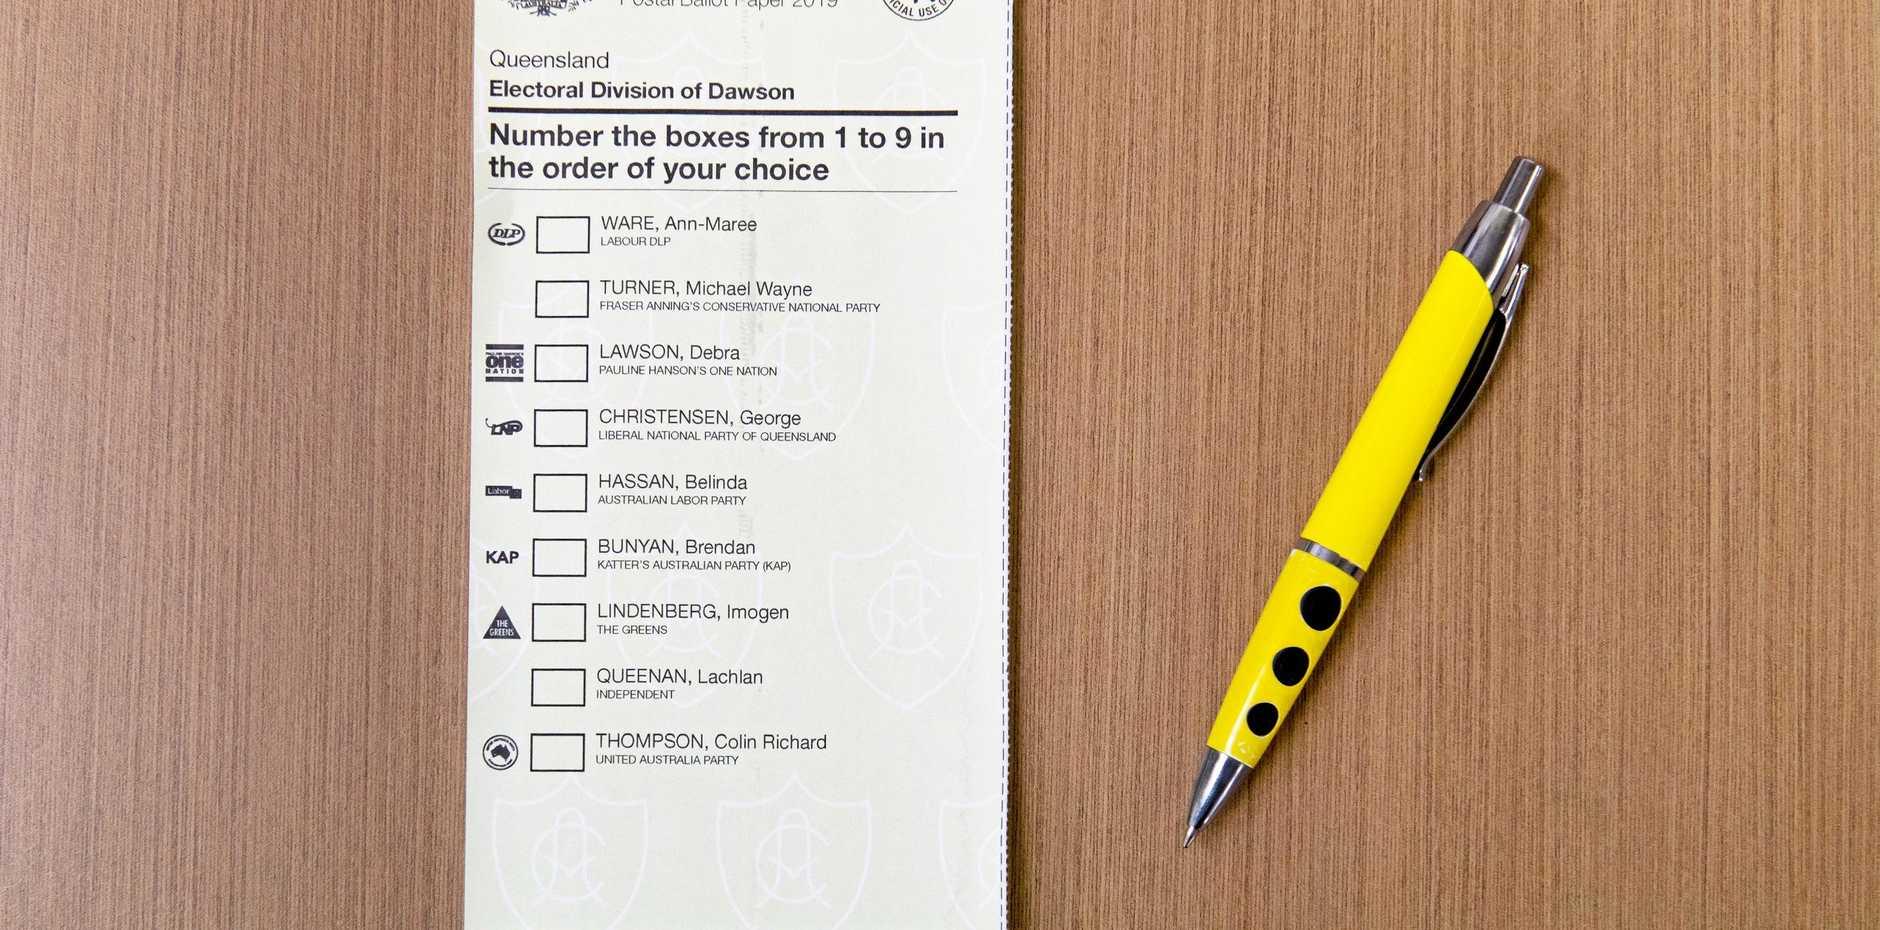 House of Representatives postal ballot paper for Dawson for 2019.